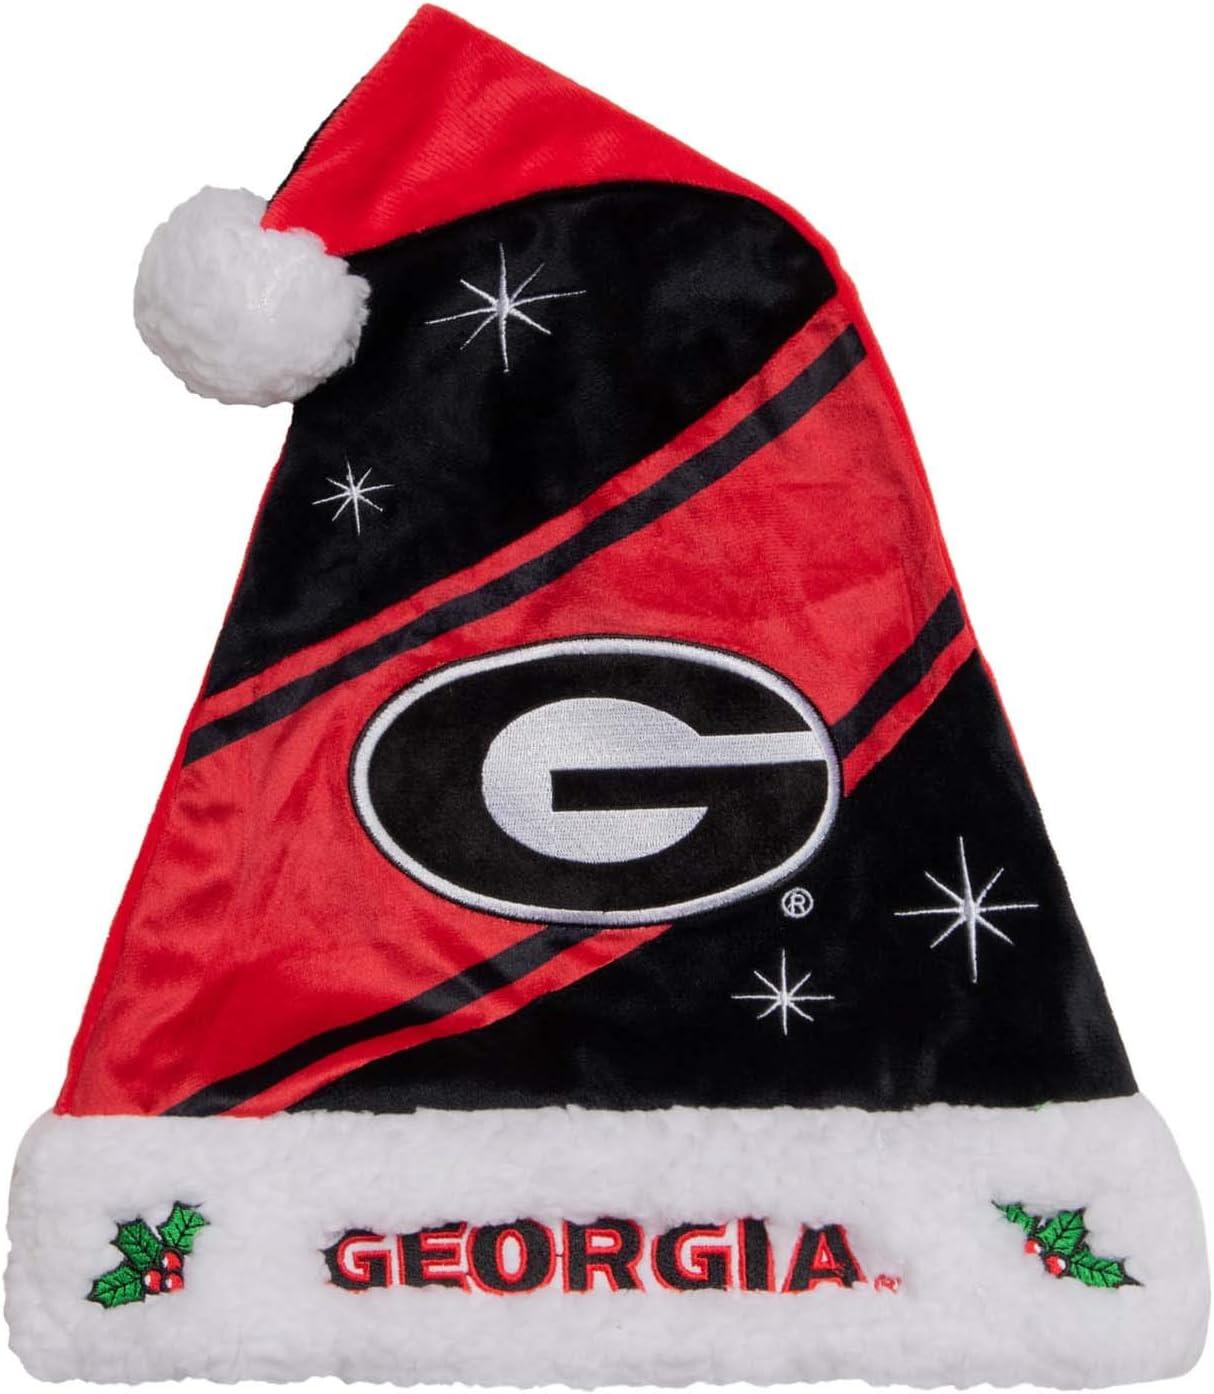 FOCO NCAA Georgia Bulldogs High End Holiday Santa Hat CapHigh End Holiday Santa Hat Cap Team Color One Size